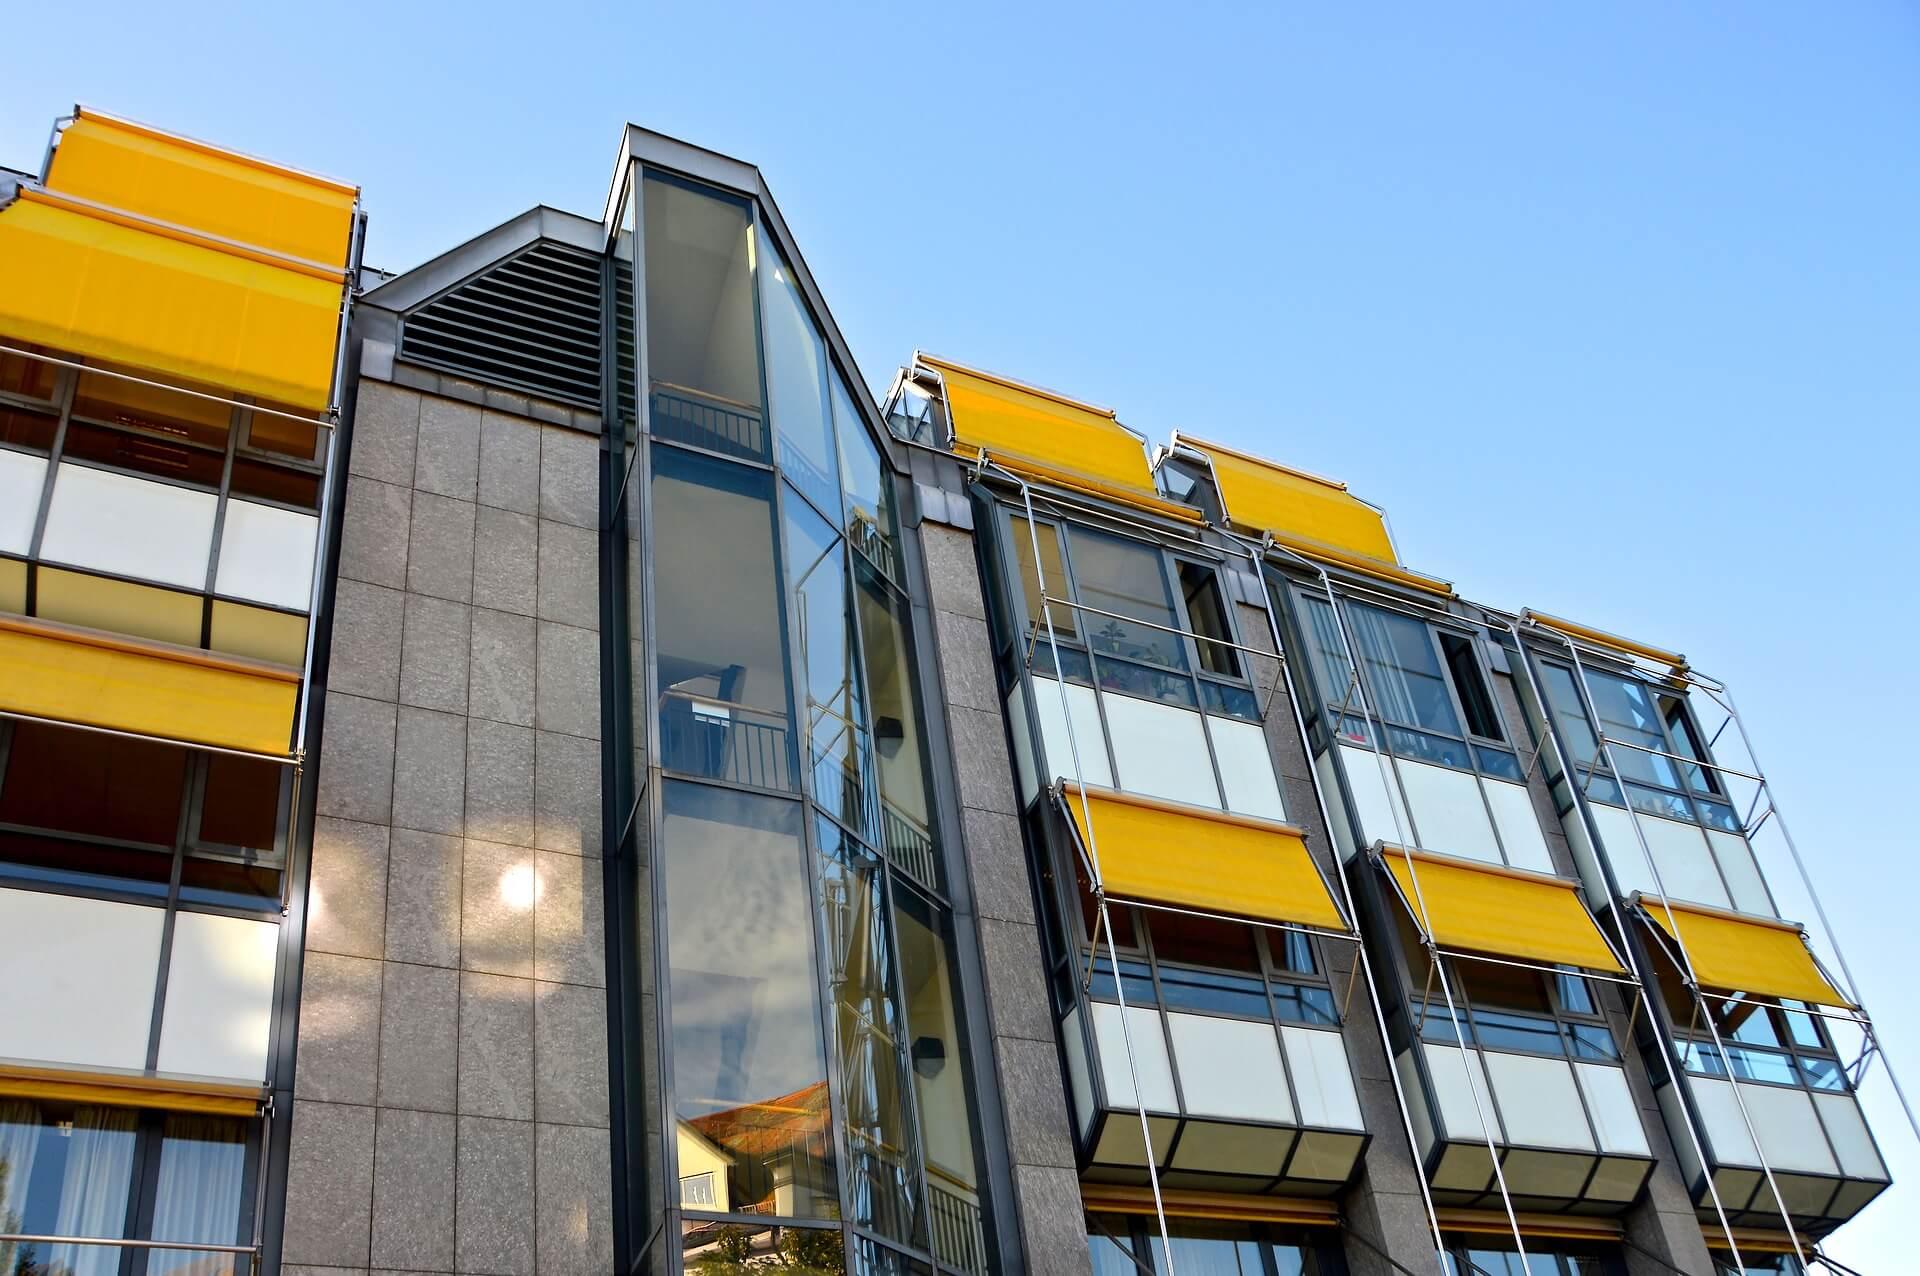 Sonnenschutz und Beschattung an Gebäuden